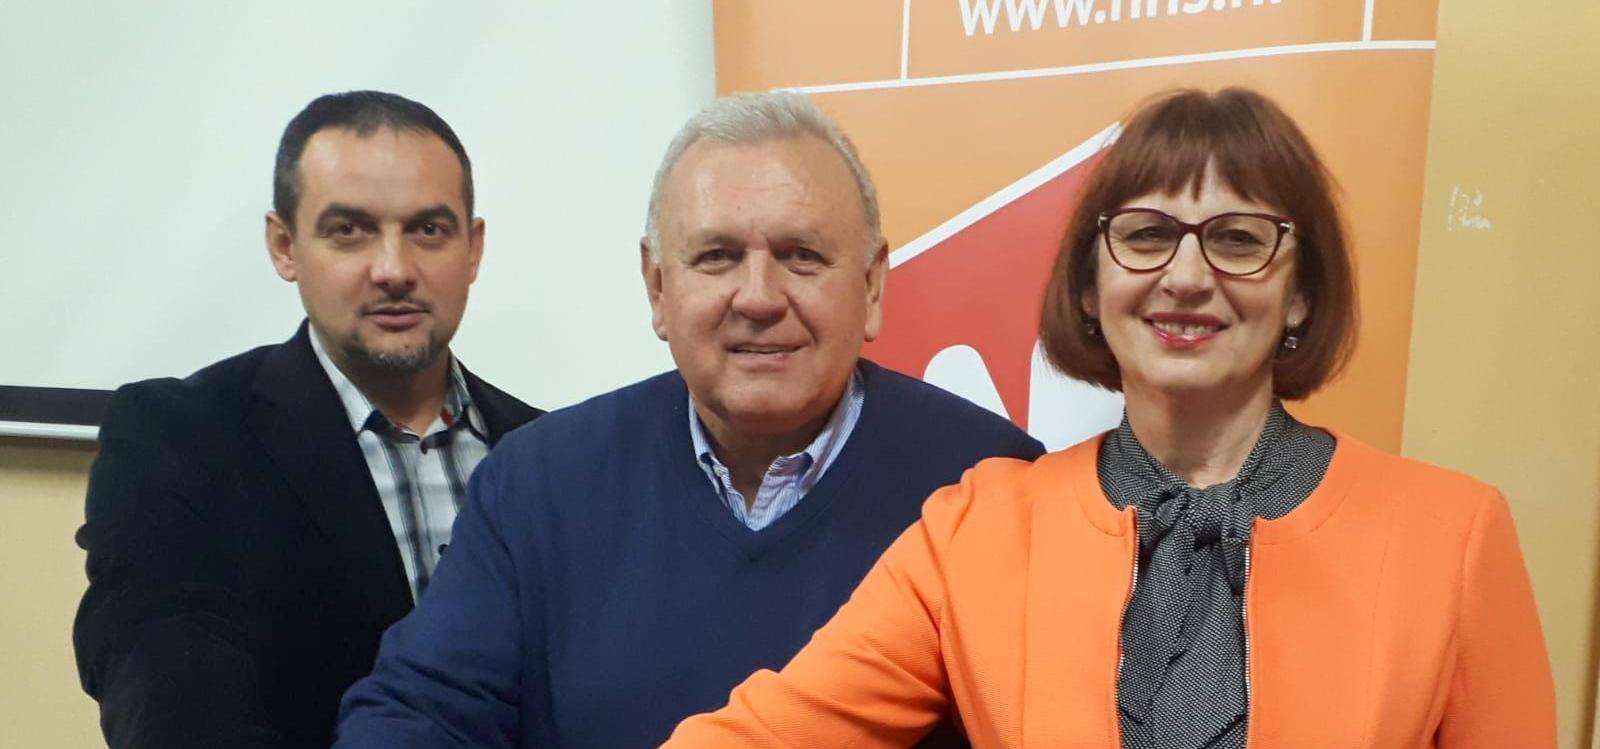 Bjelovarski HNS: HDZ i njihov kandidat Marko Marušić i dalje su protiv gradnje bjelovarske bolnice